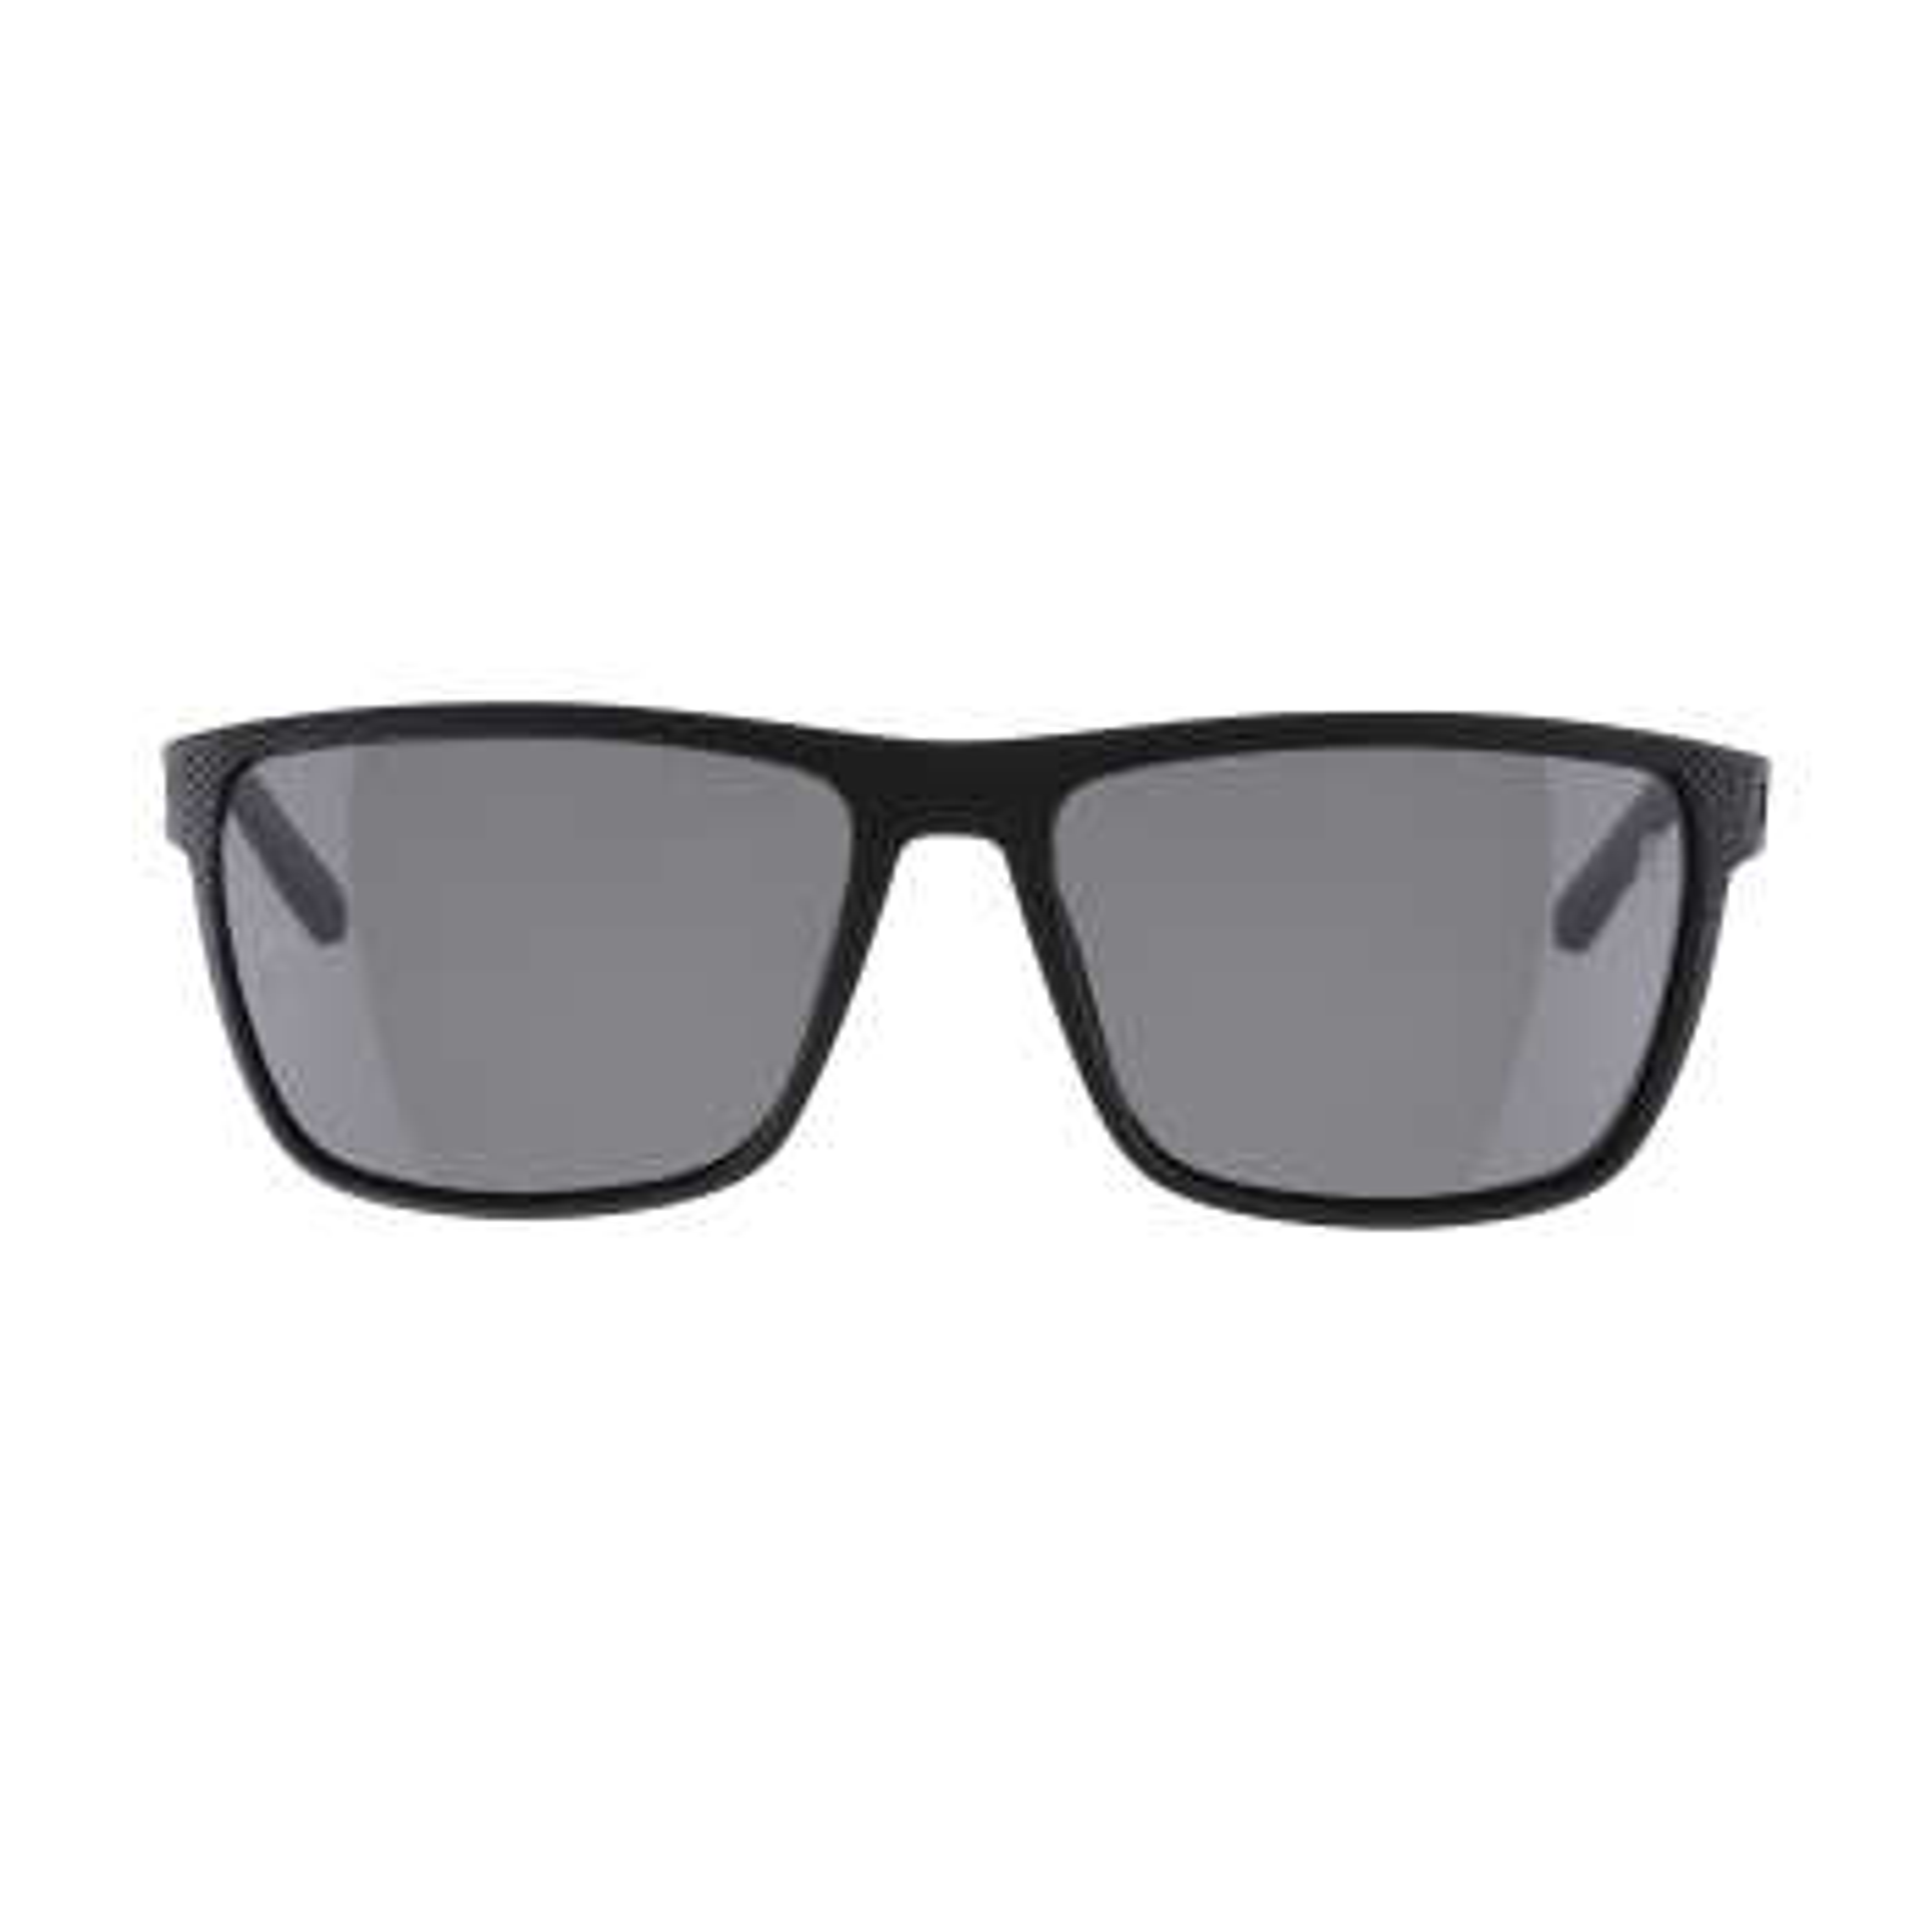 عینک آفتابی مردانه کد  78211WBLK